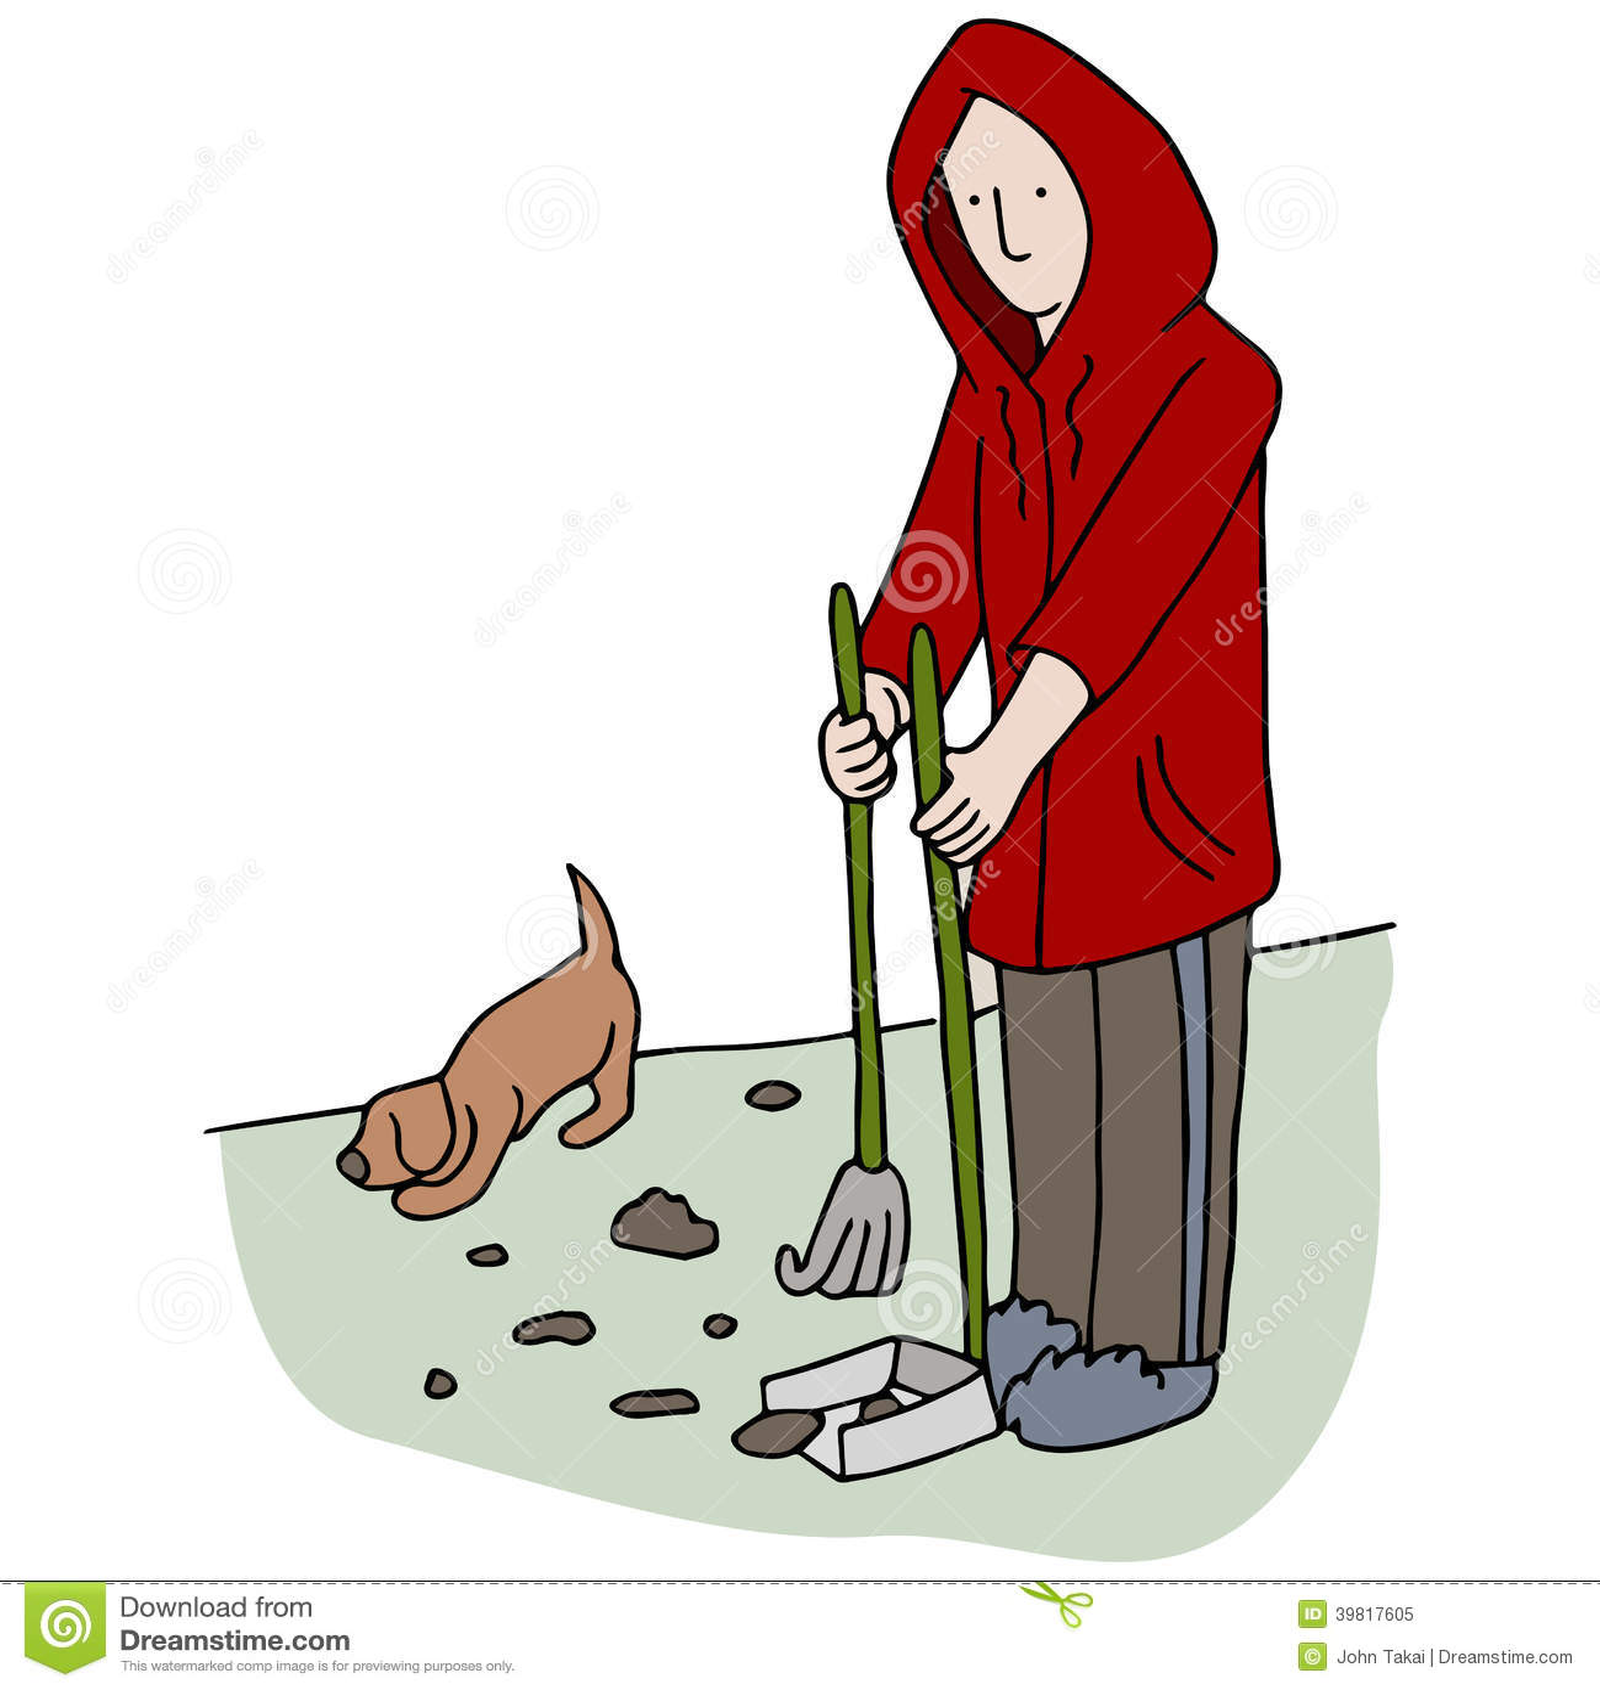 Picking Up Dog Poop Stock Vector - Image: 39817605